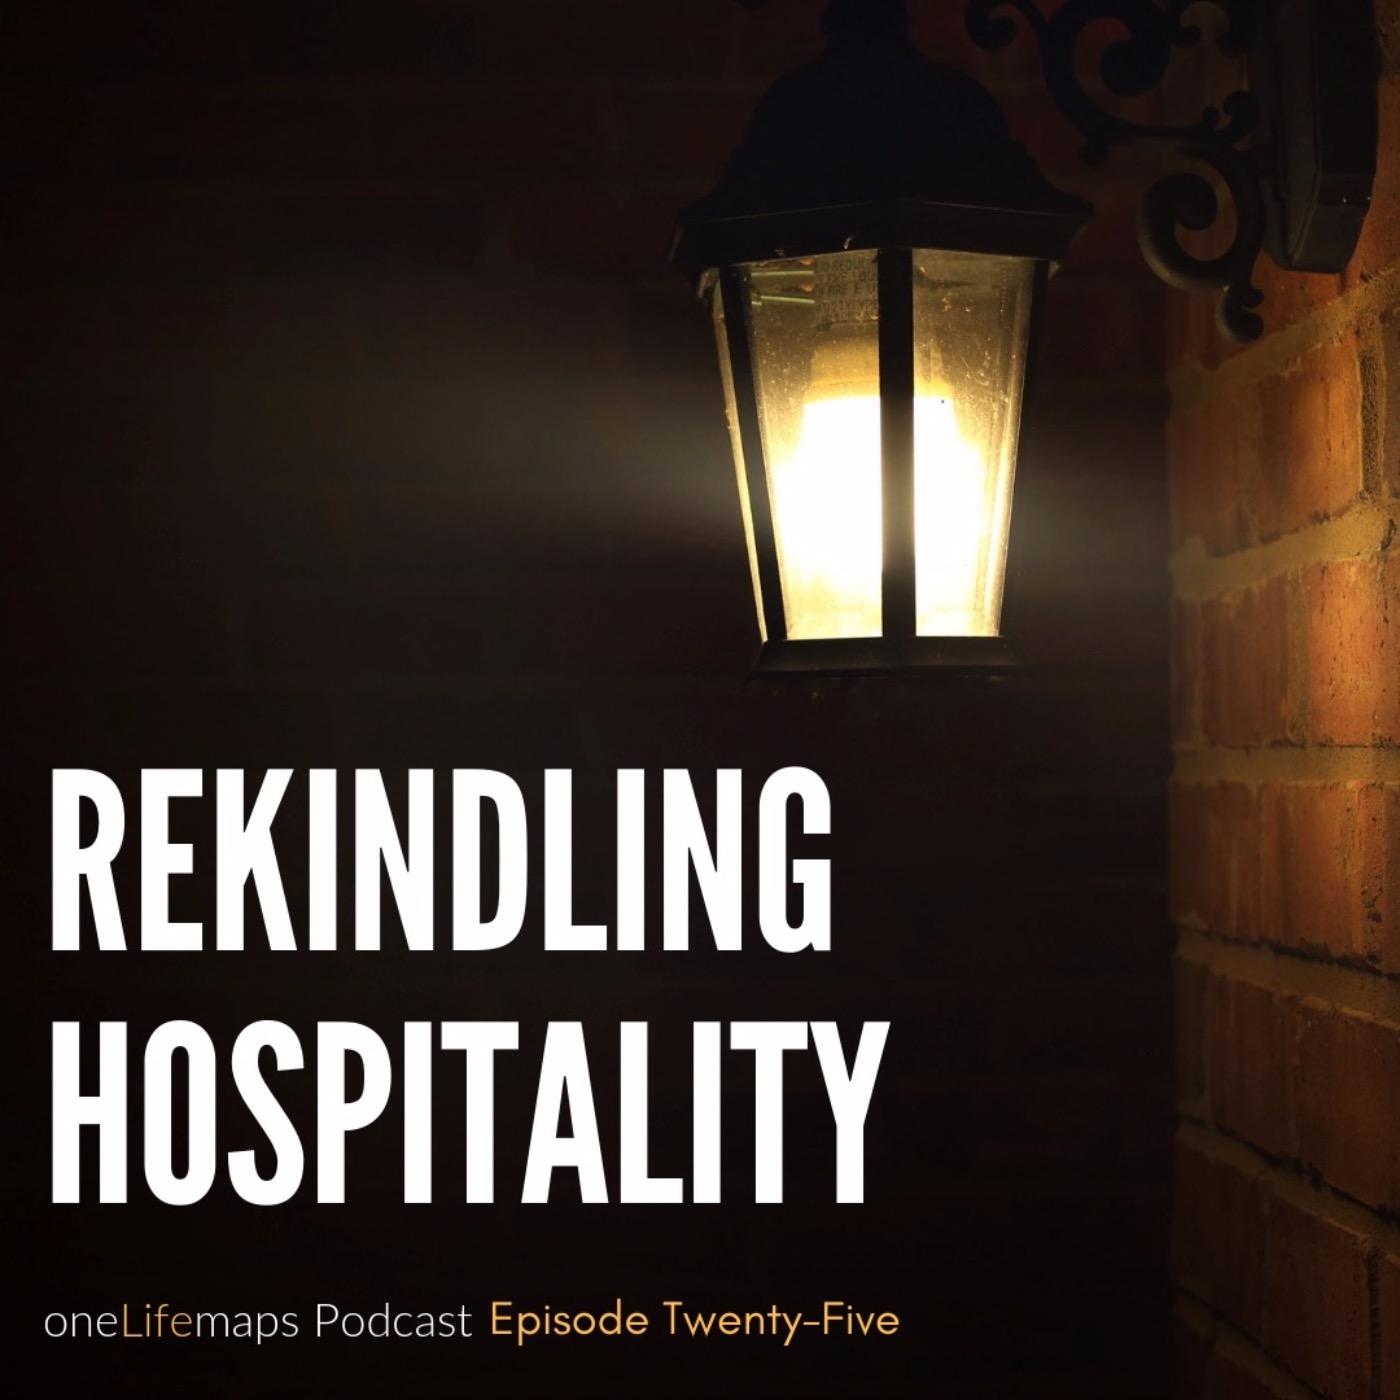 Rekindling Hospitality